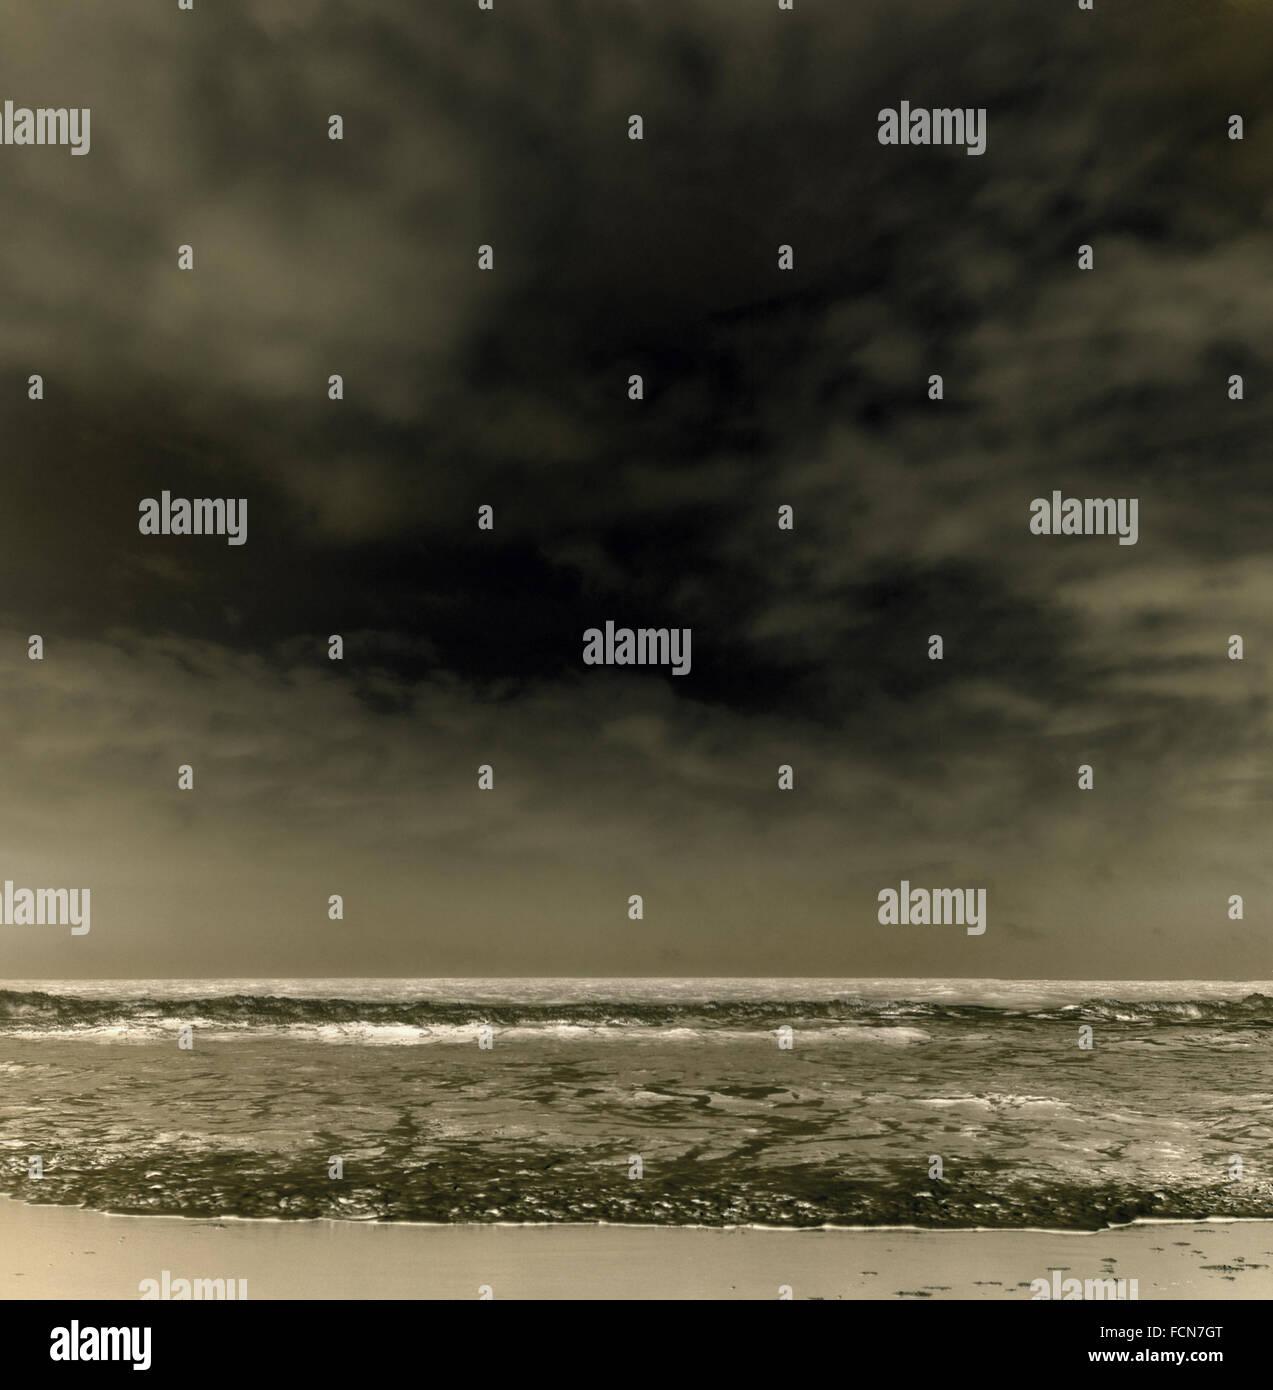 bw ocean waves - Stock Image